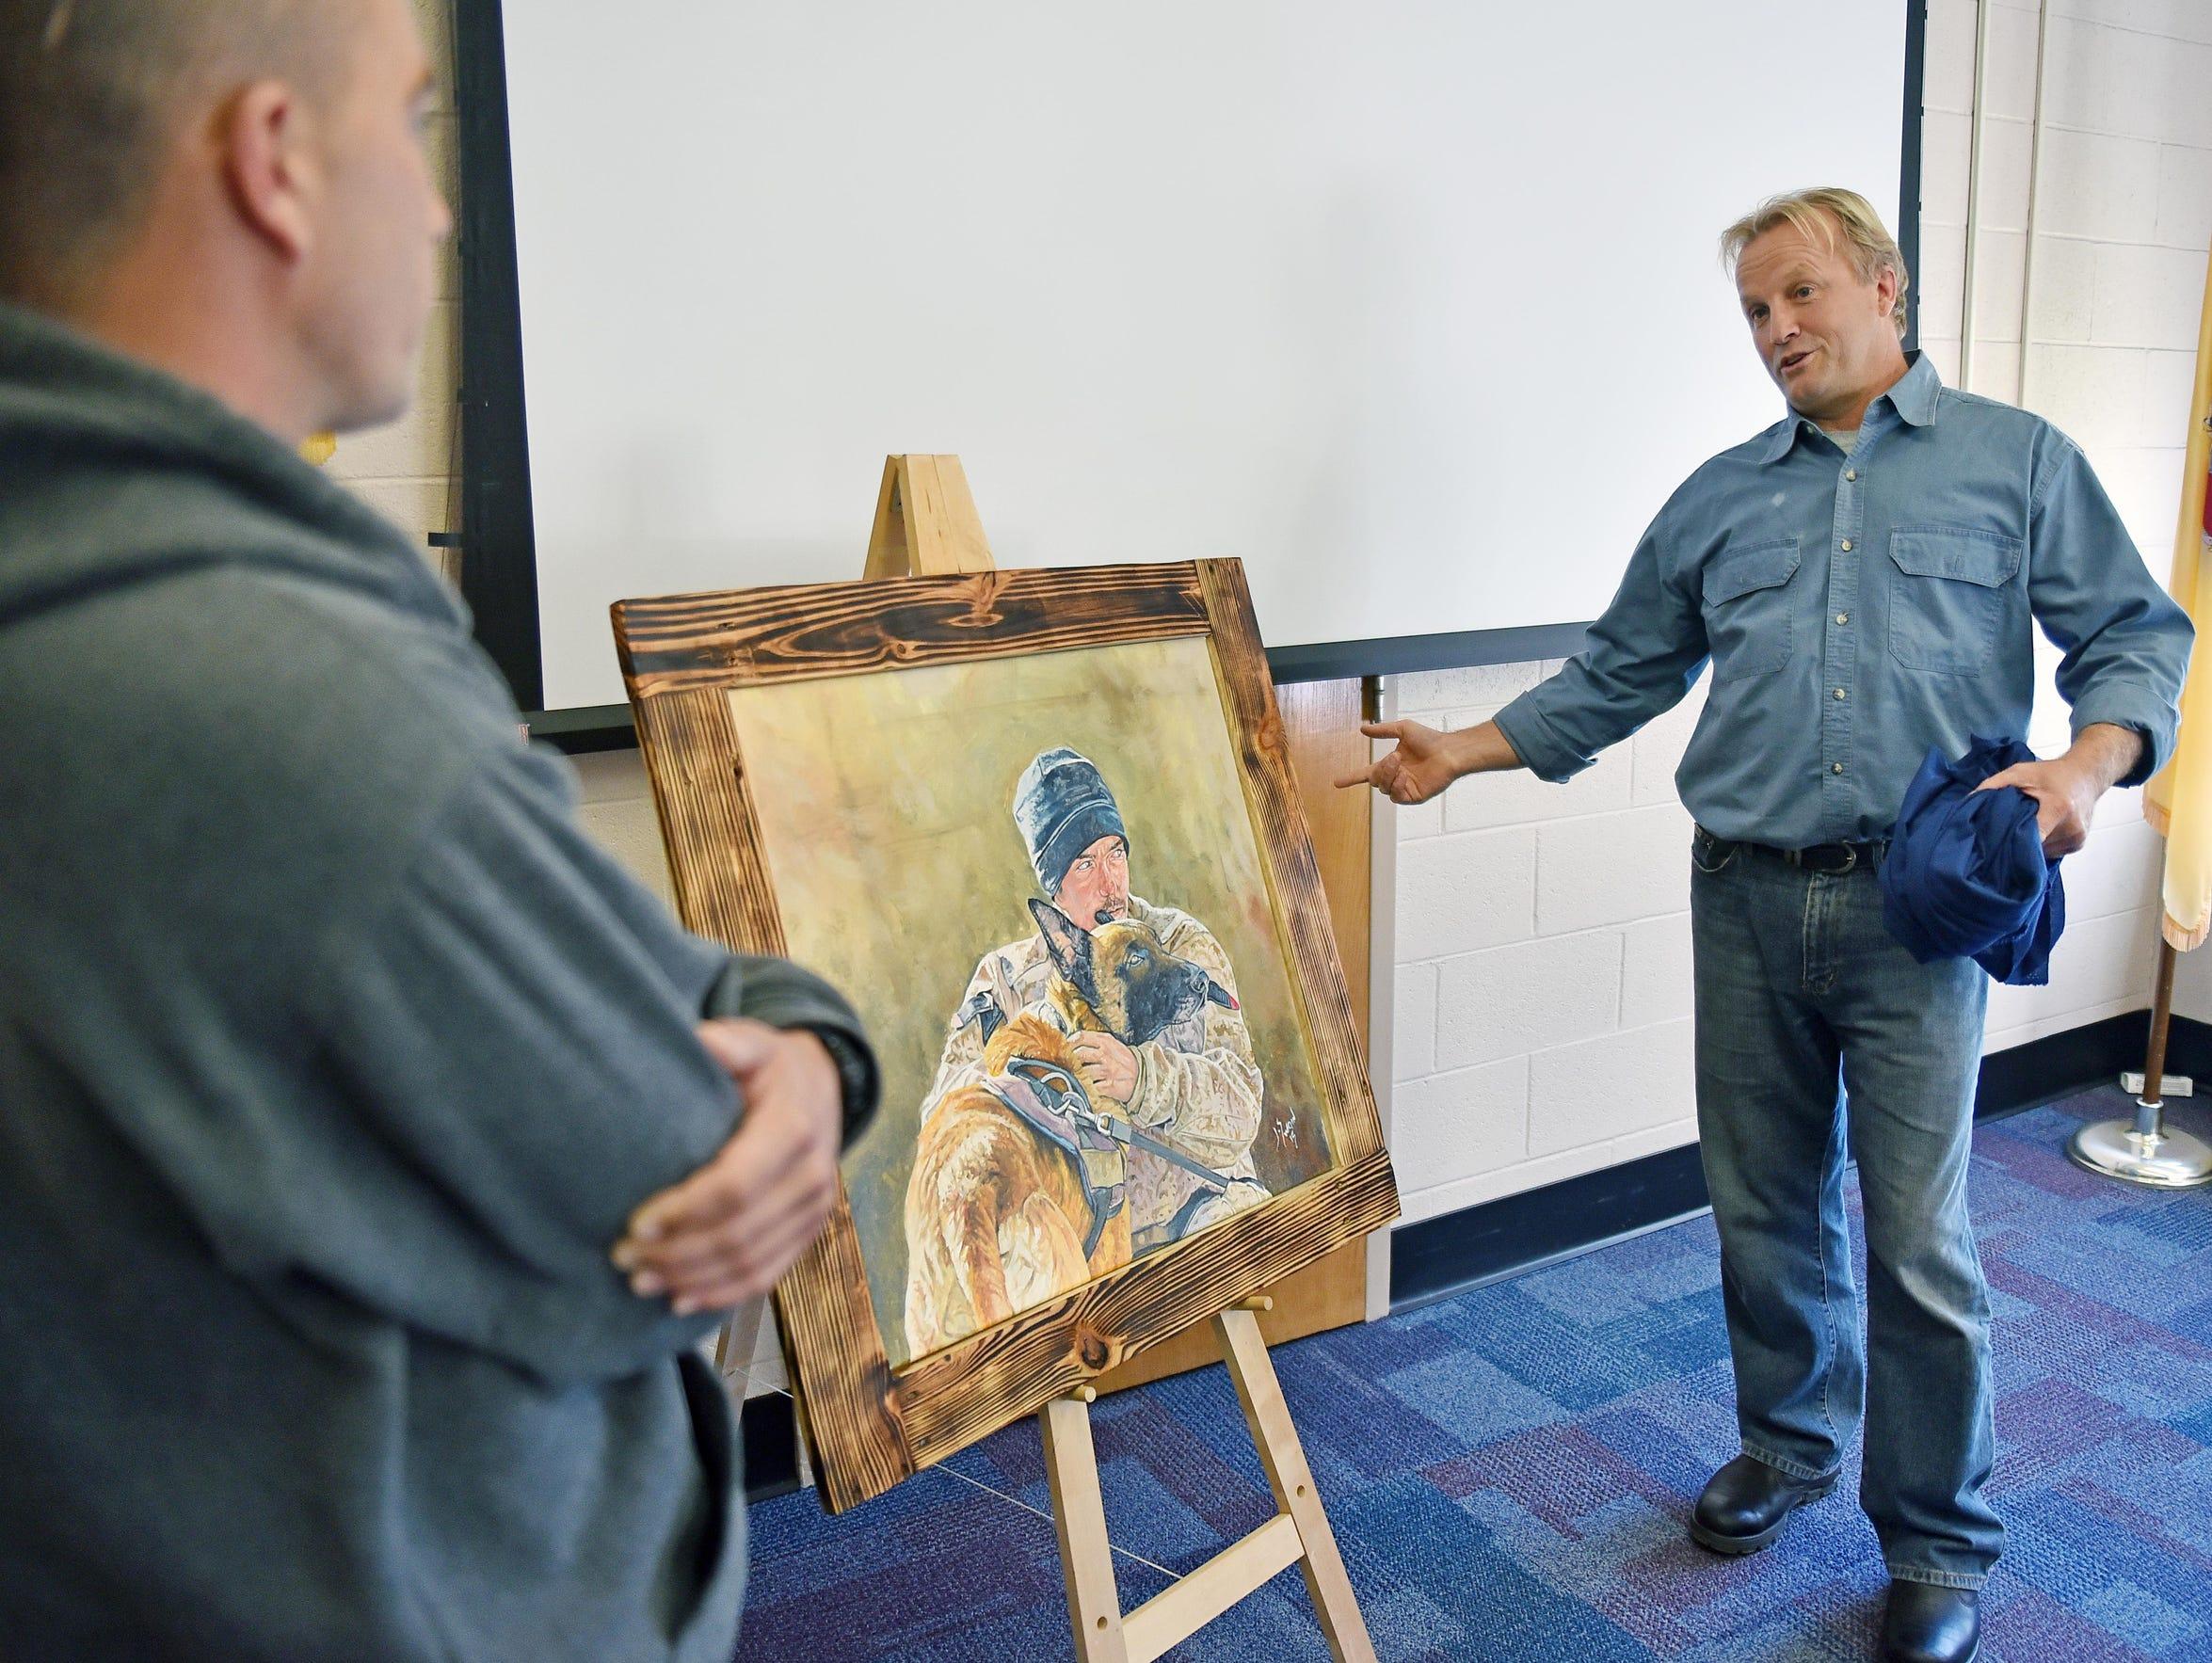 Artist  Jason Swain (right) of Kensington,MD did a